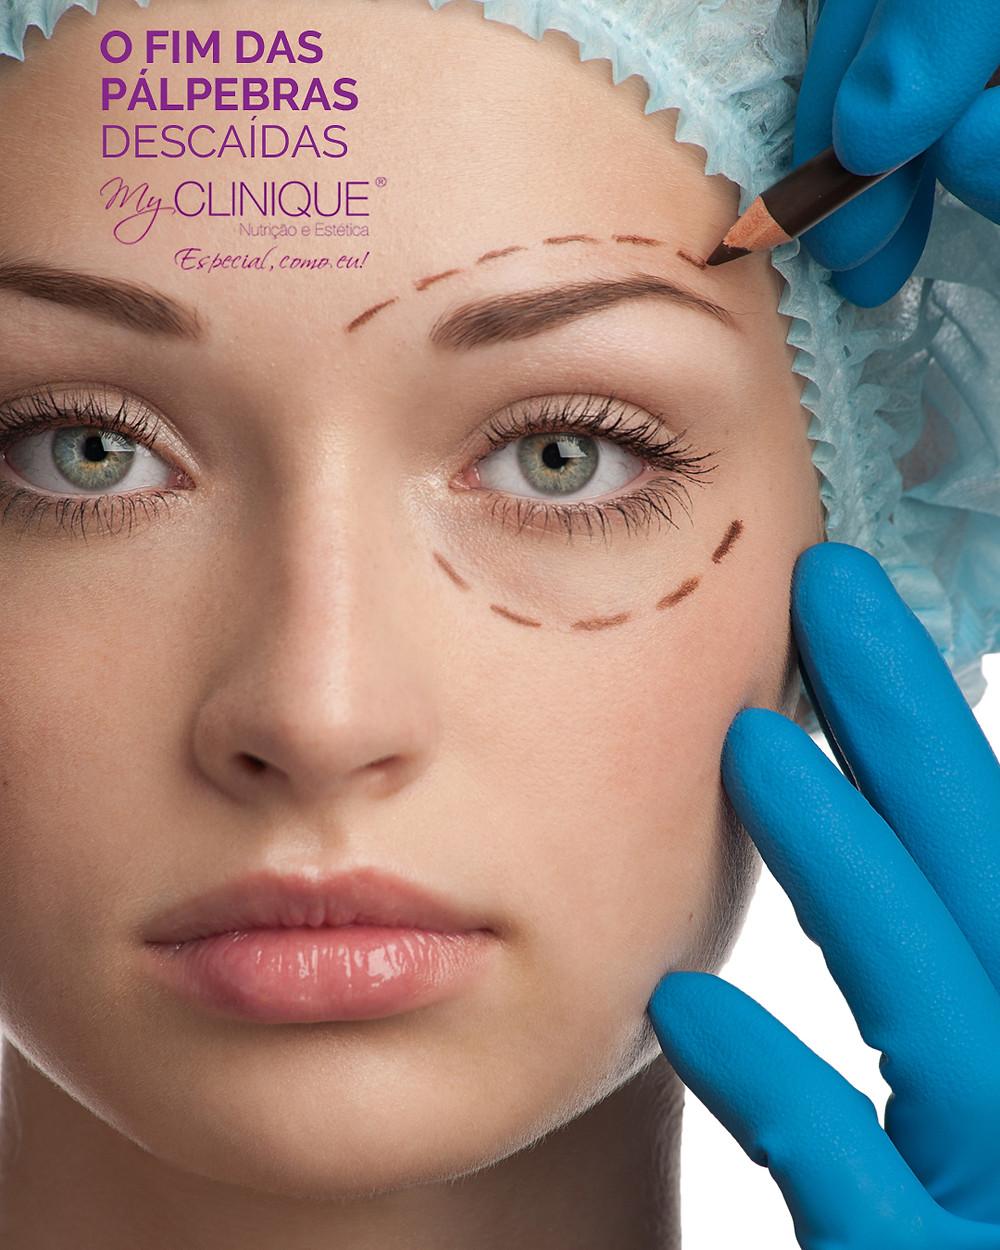 myclinique blefaroplastia cirurgia das palpebras